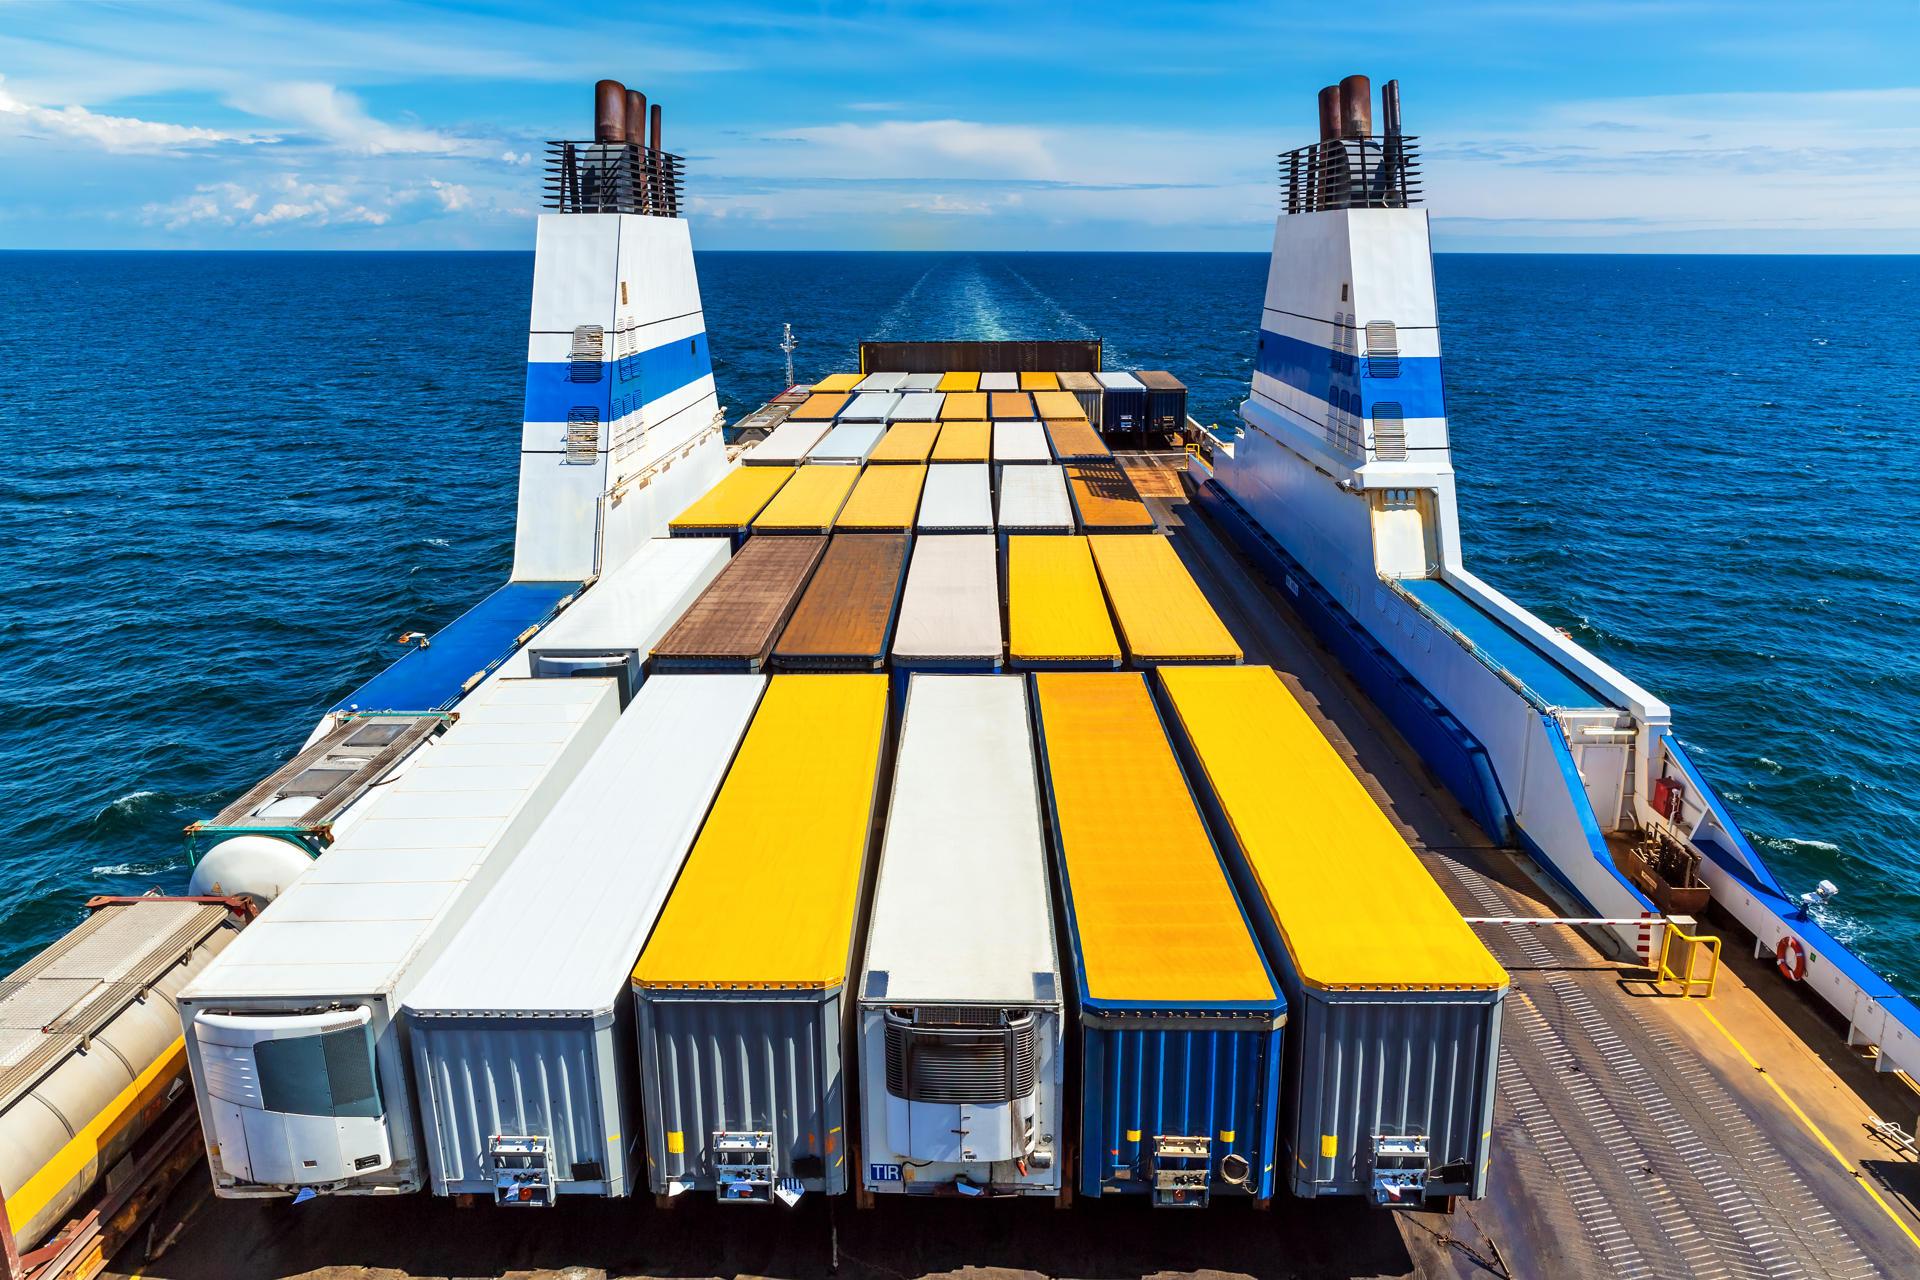 Biggest Ocean Freight /><div class='extra_thumbnails'><img class=